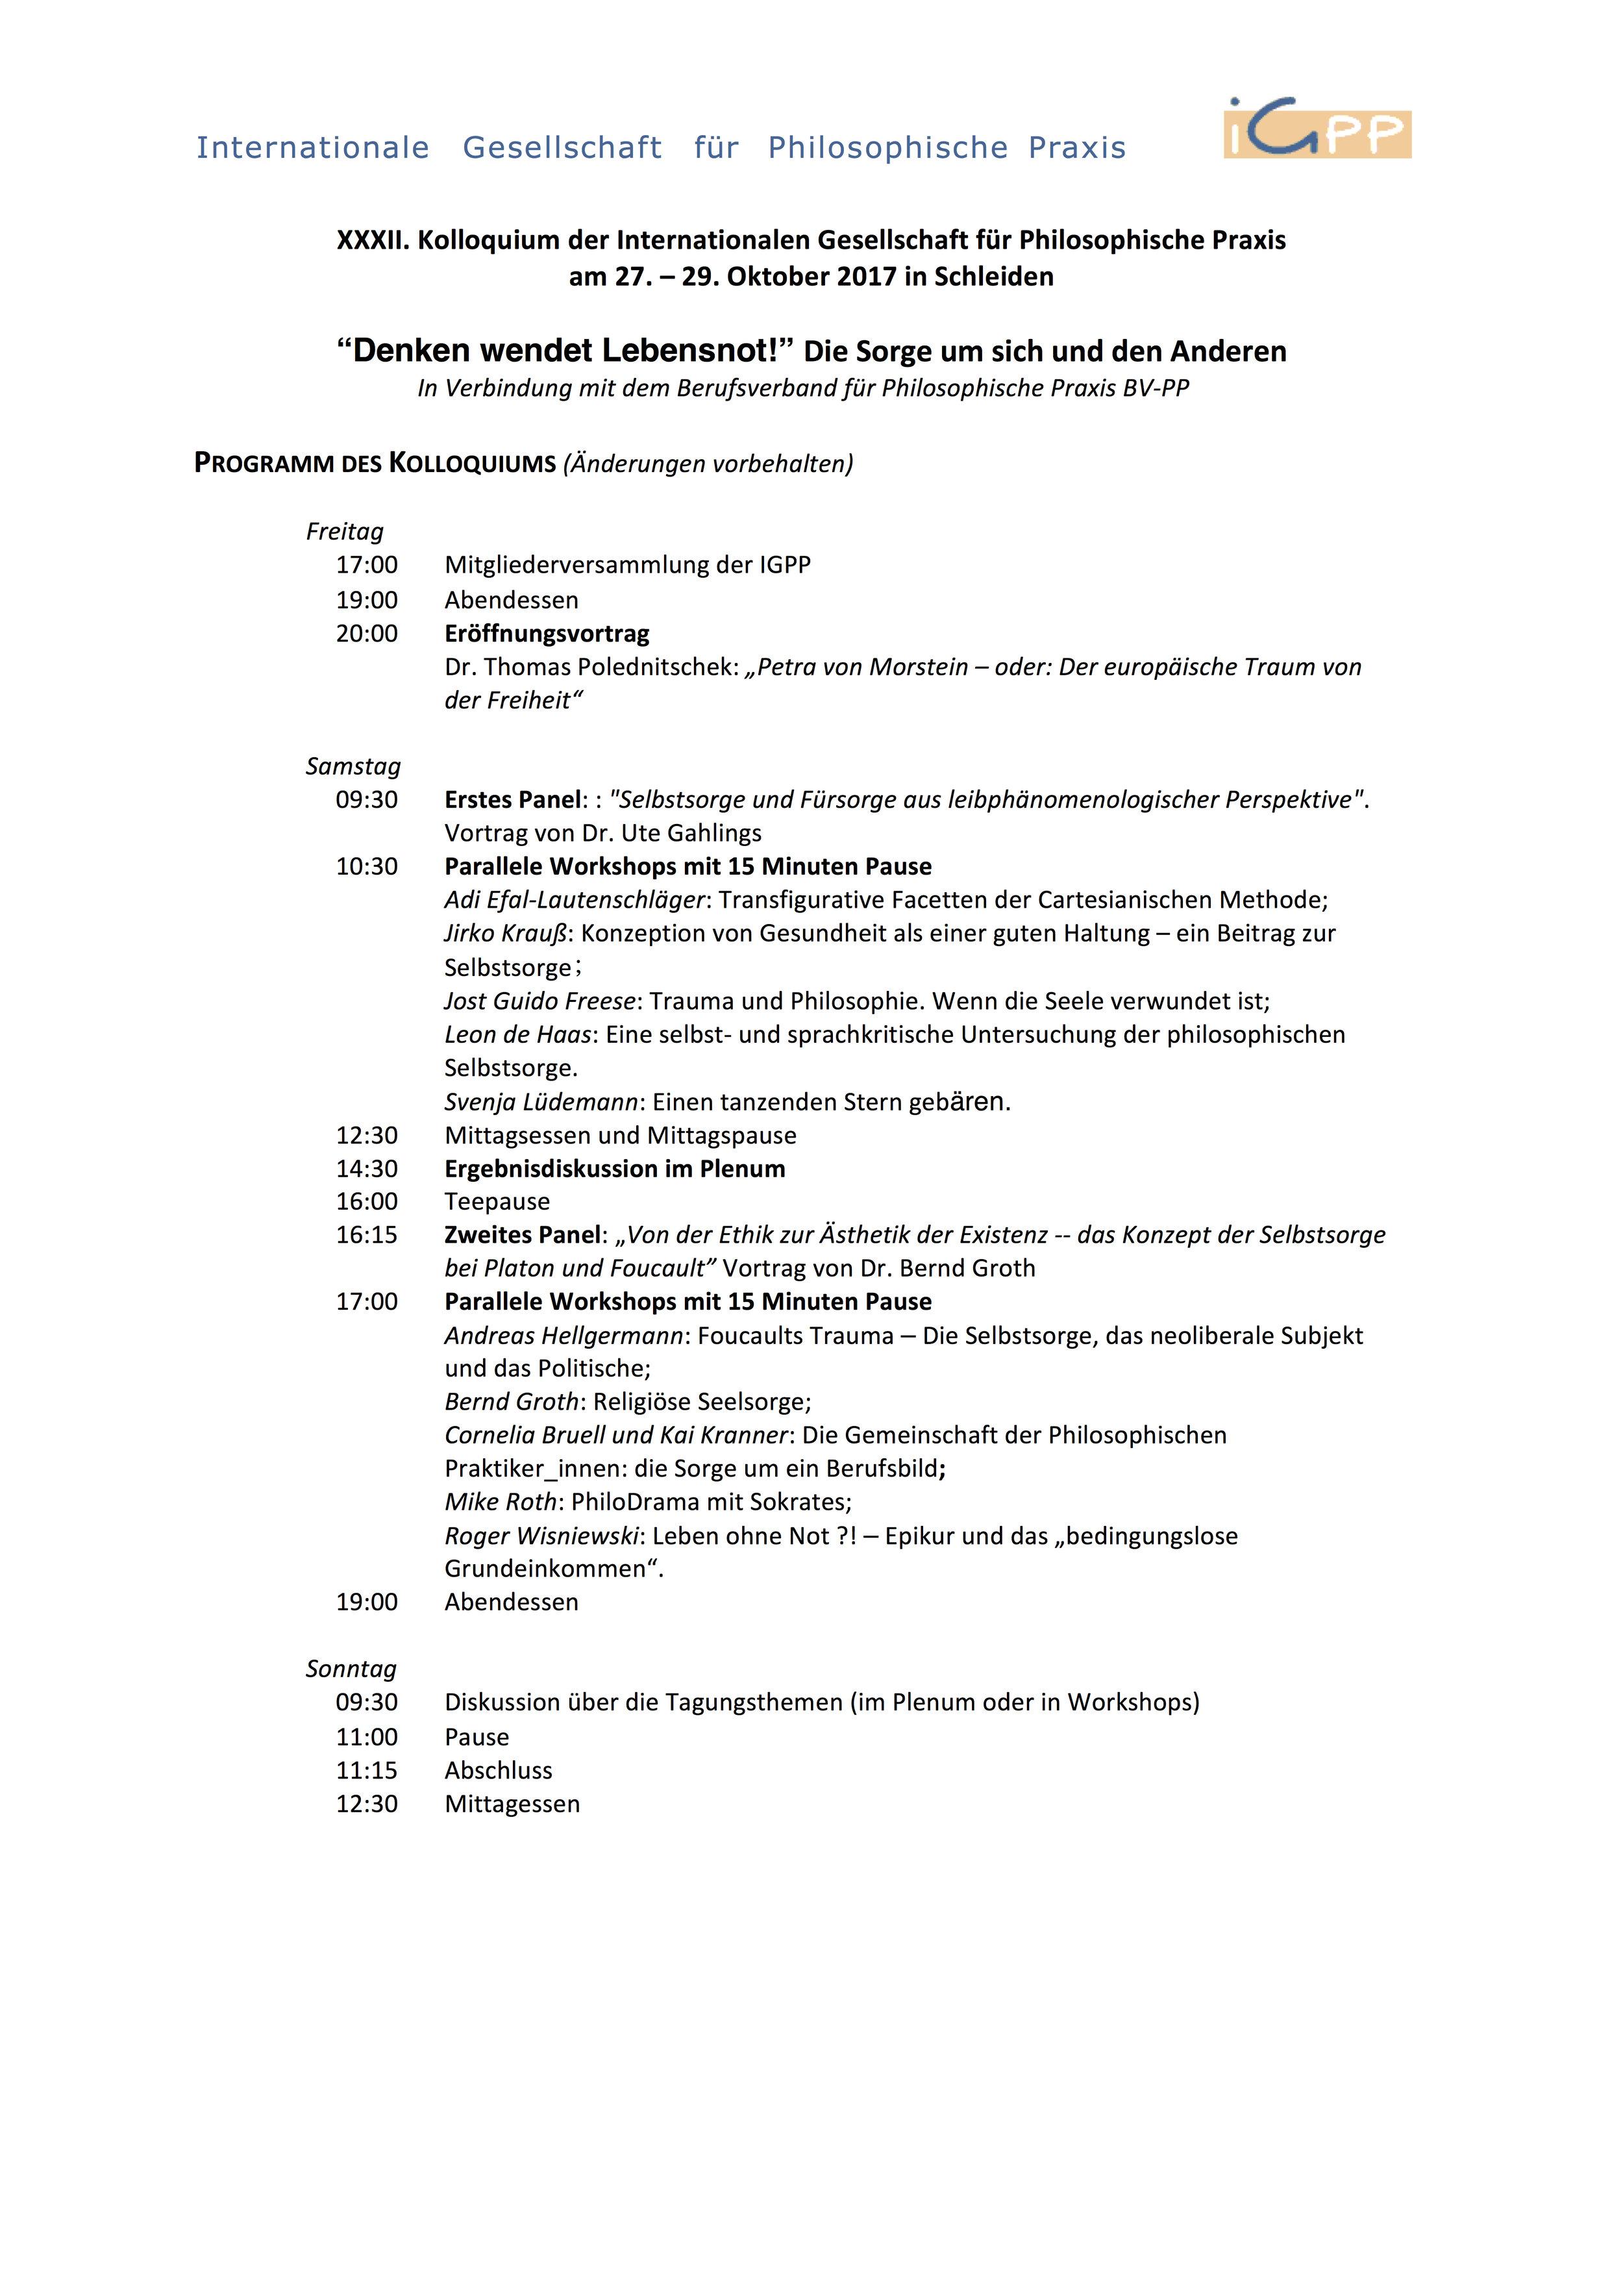 Programm-Herbstkolloquium-2017.jpg